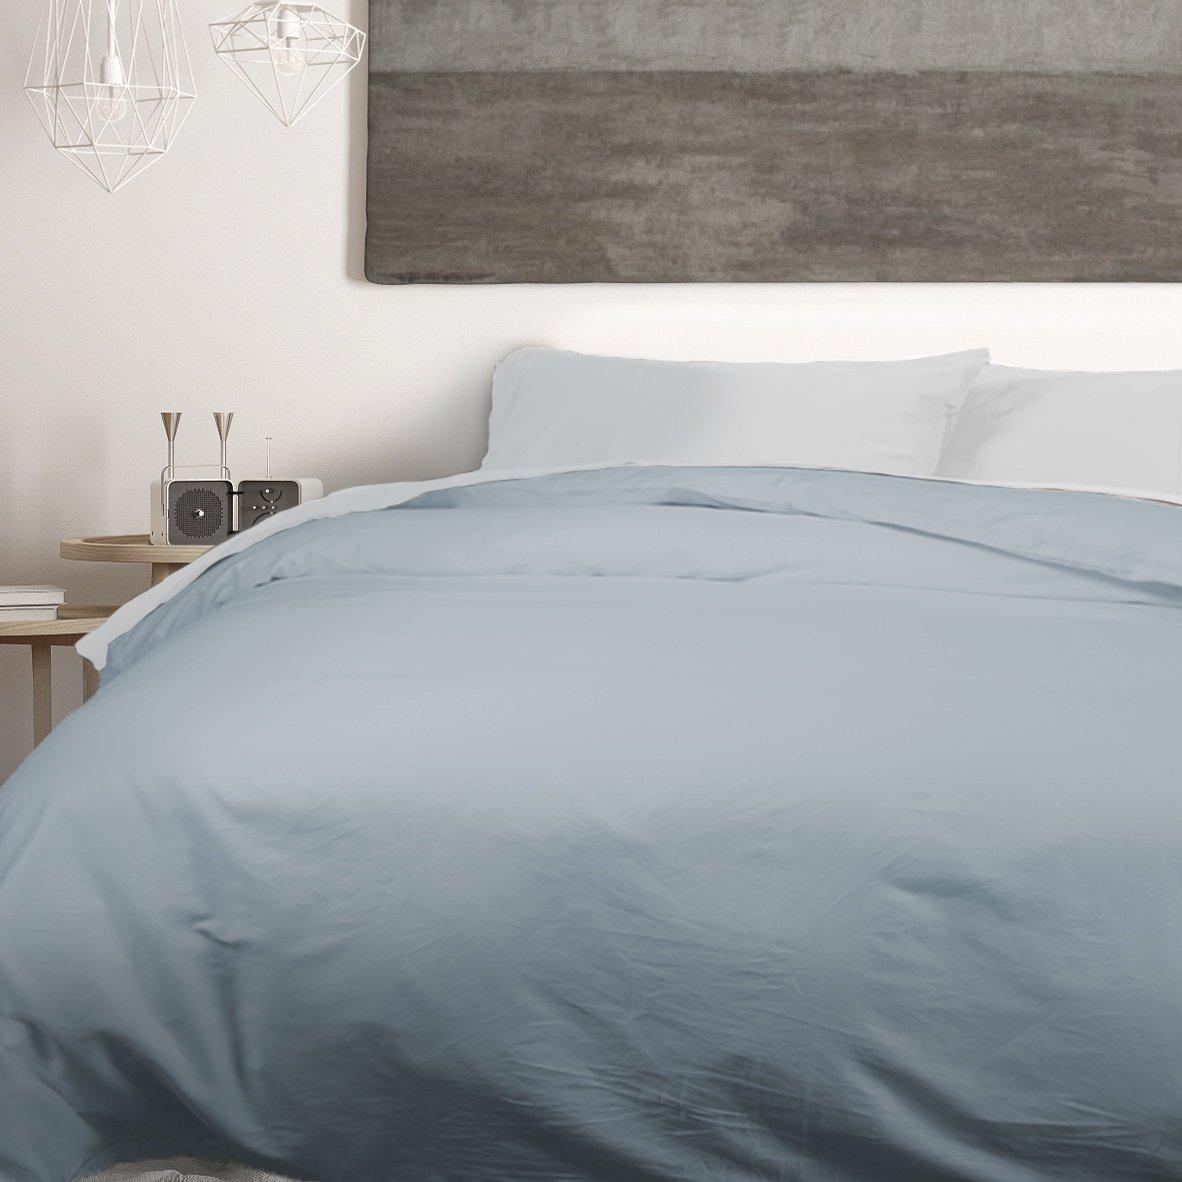 QE Home- 500TC Cotton Sateen 1pc Duvet Cover - Cool Blue | King